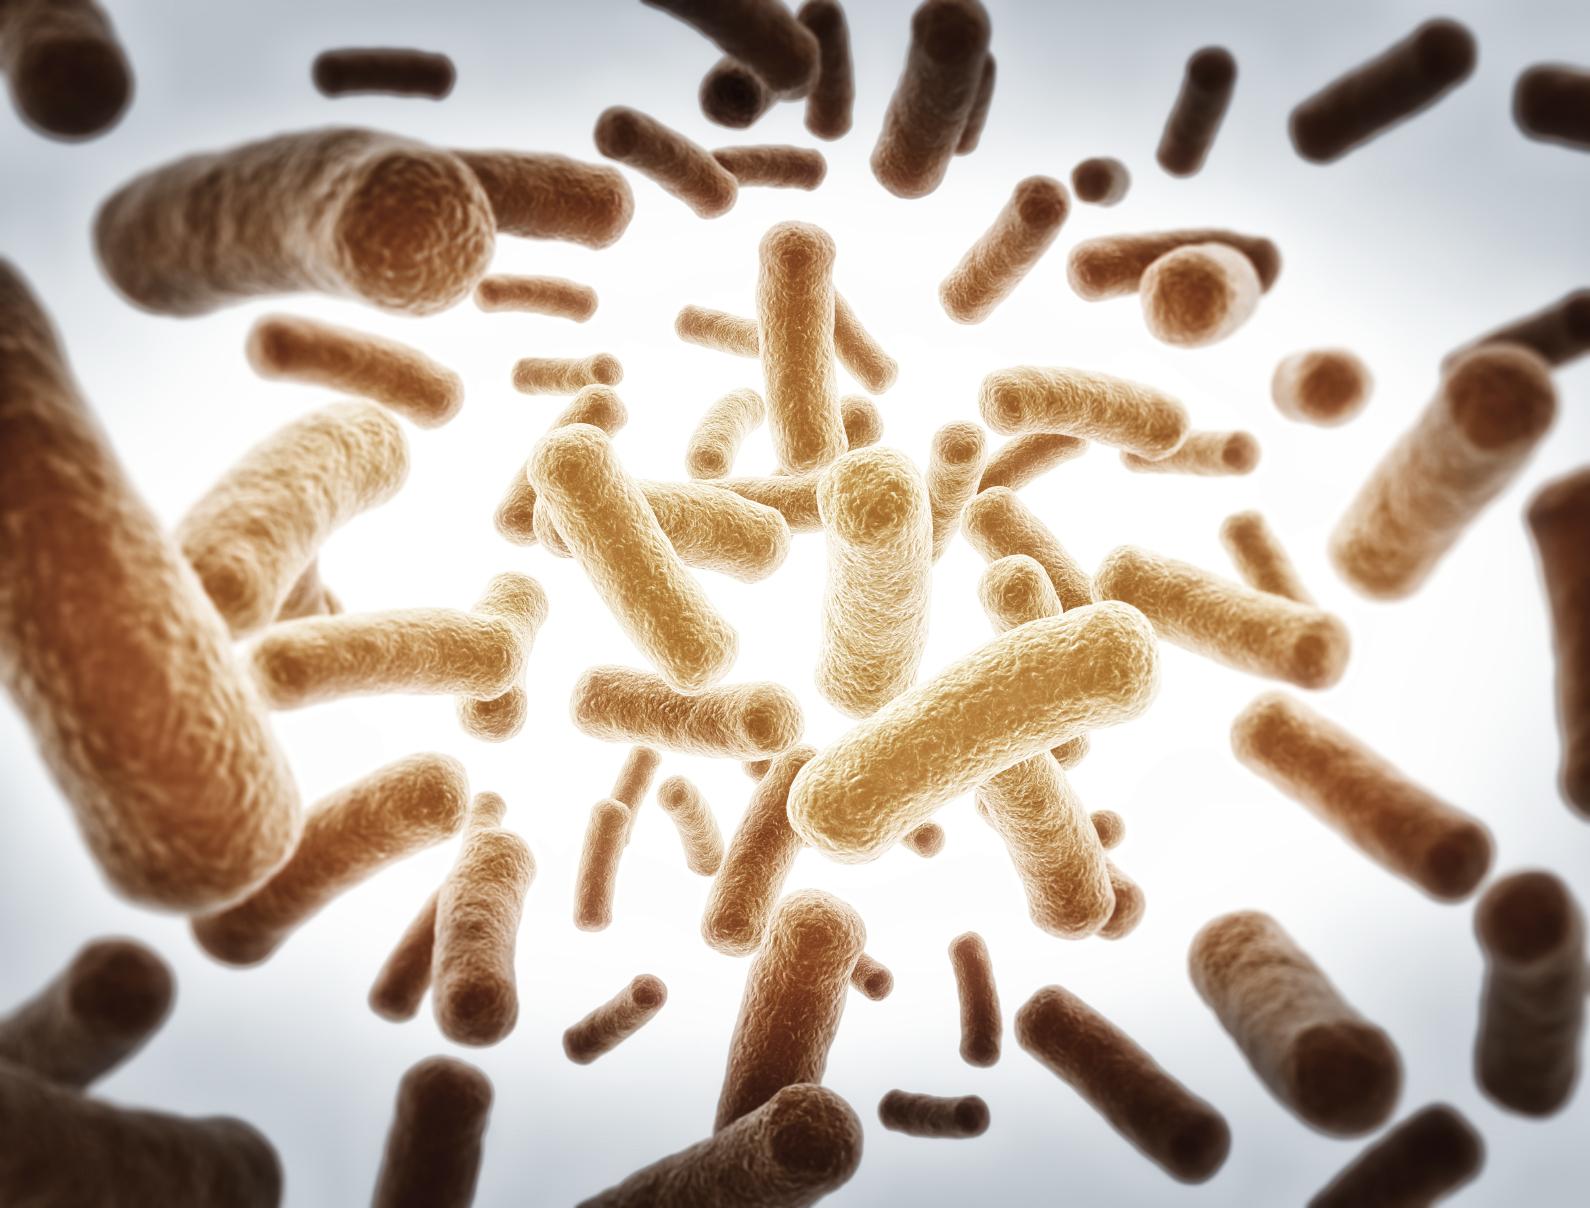 Pathogenic Yeast and Food Spoilage Photo